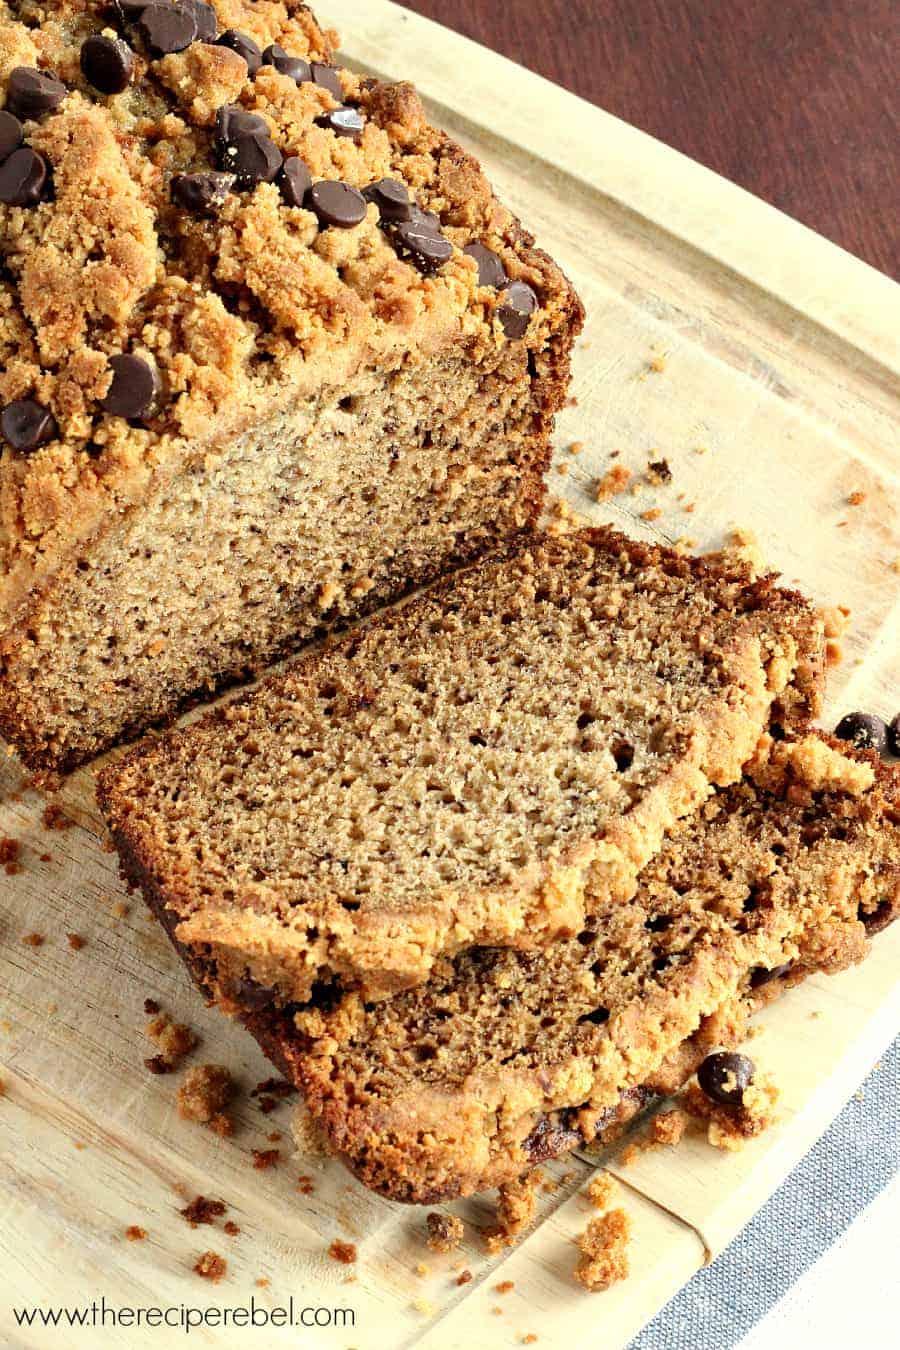 Peanut Butter Chocolate Chip Streusel Banana Bread - The Recipe Rebel